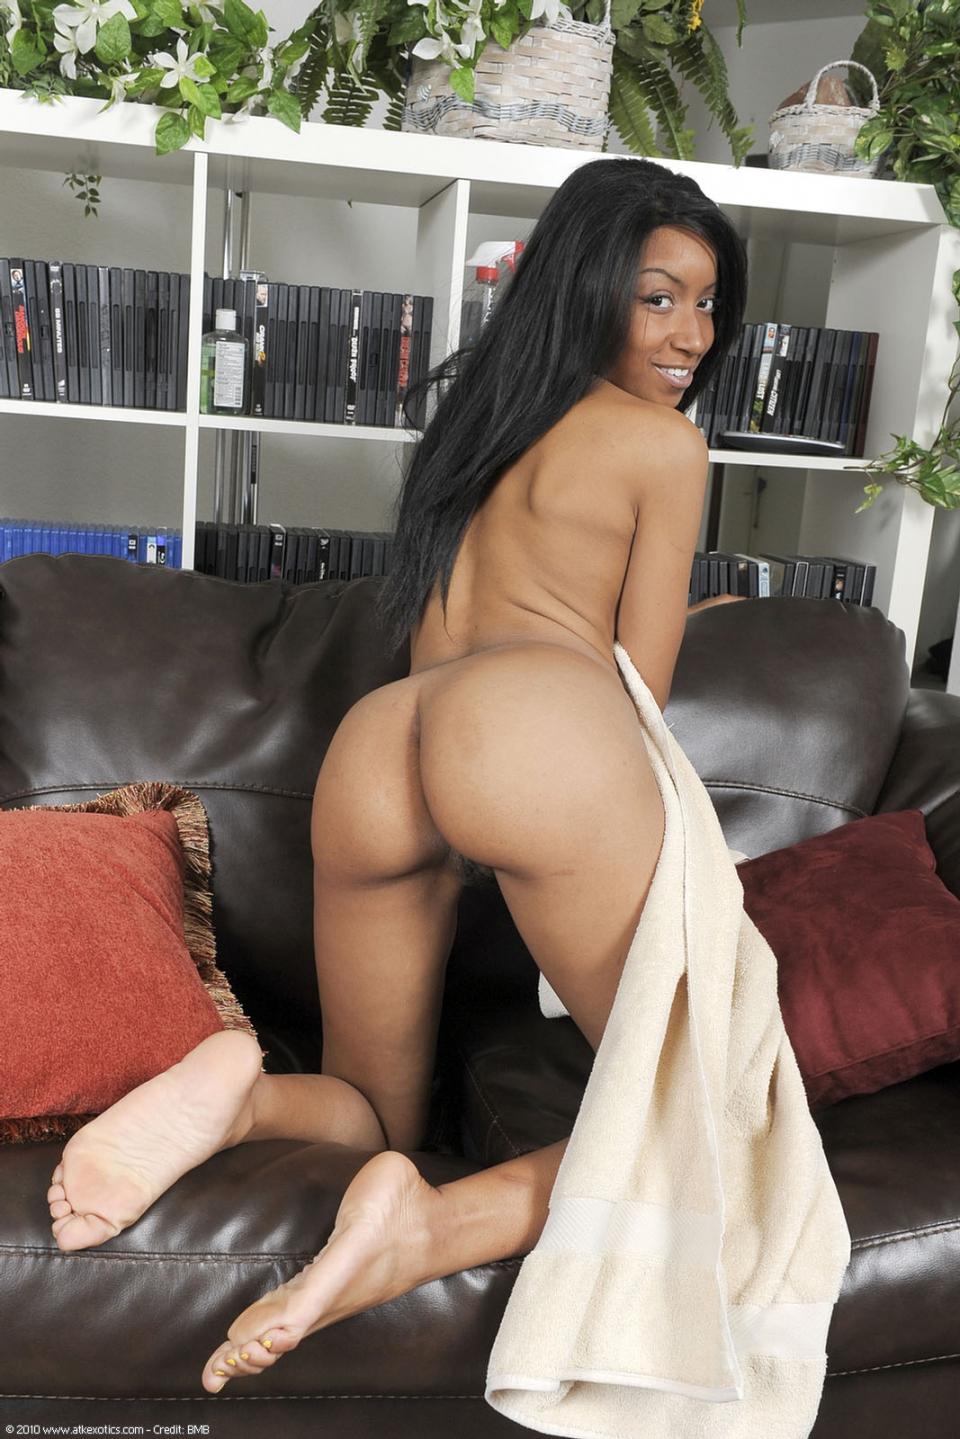 nude photo irish girl